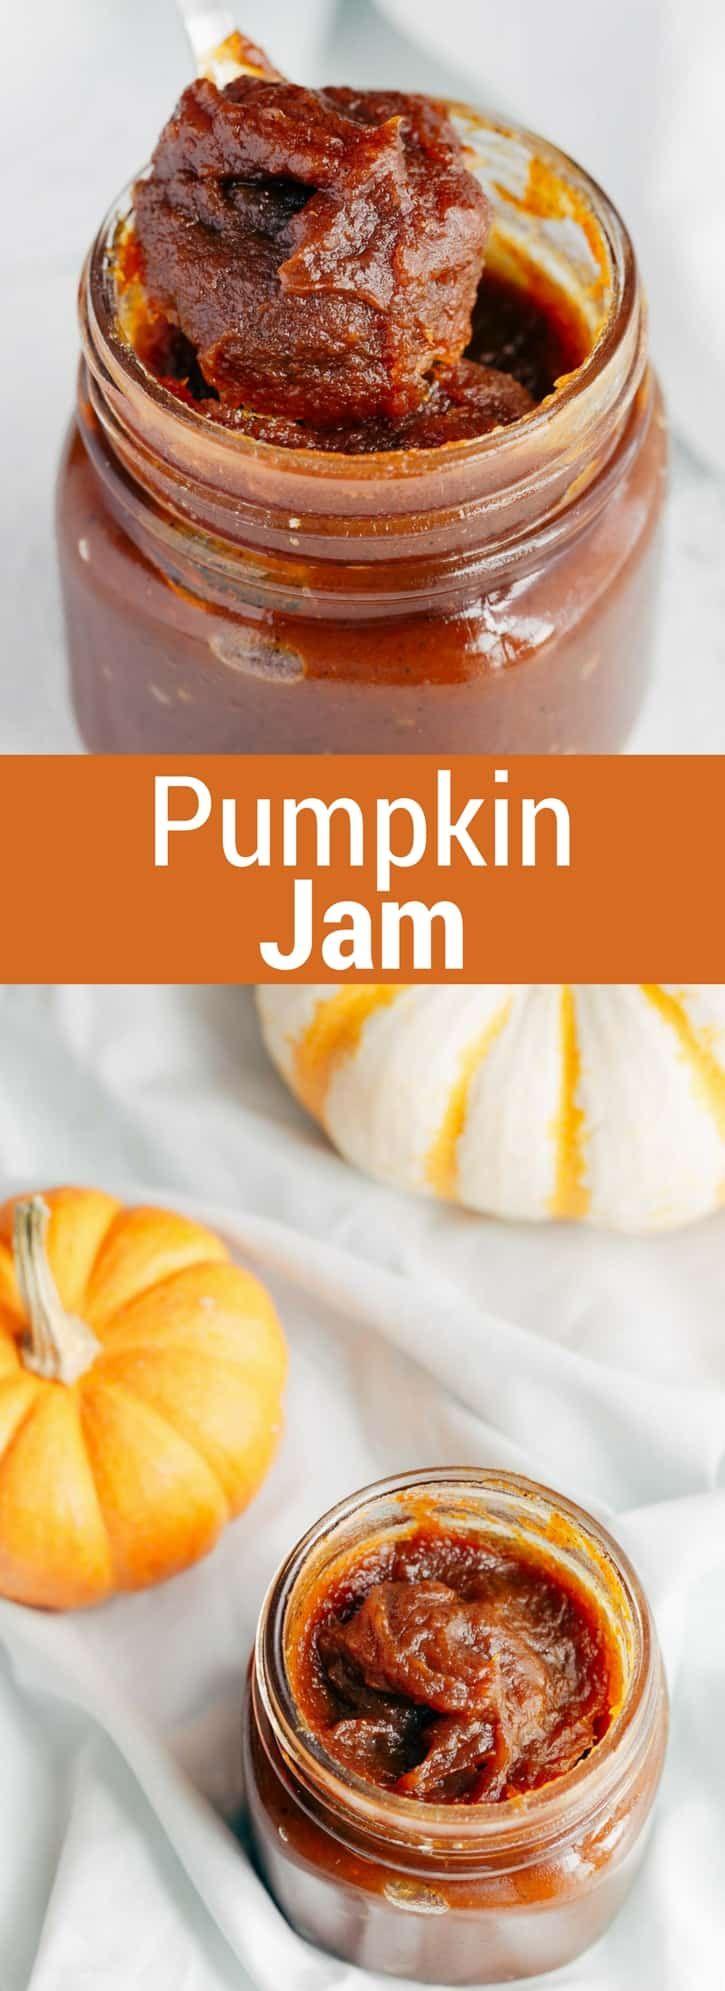 Delicious Pumpkin Jam that tastes like pumpkin pie. It's fantastic on bagels or toast--full step-by-step recipe on bakedbyanintrovert.com #pumpkin #jam